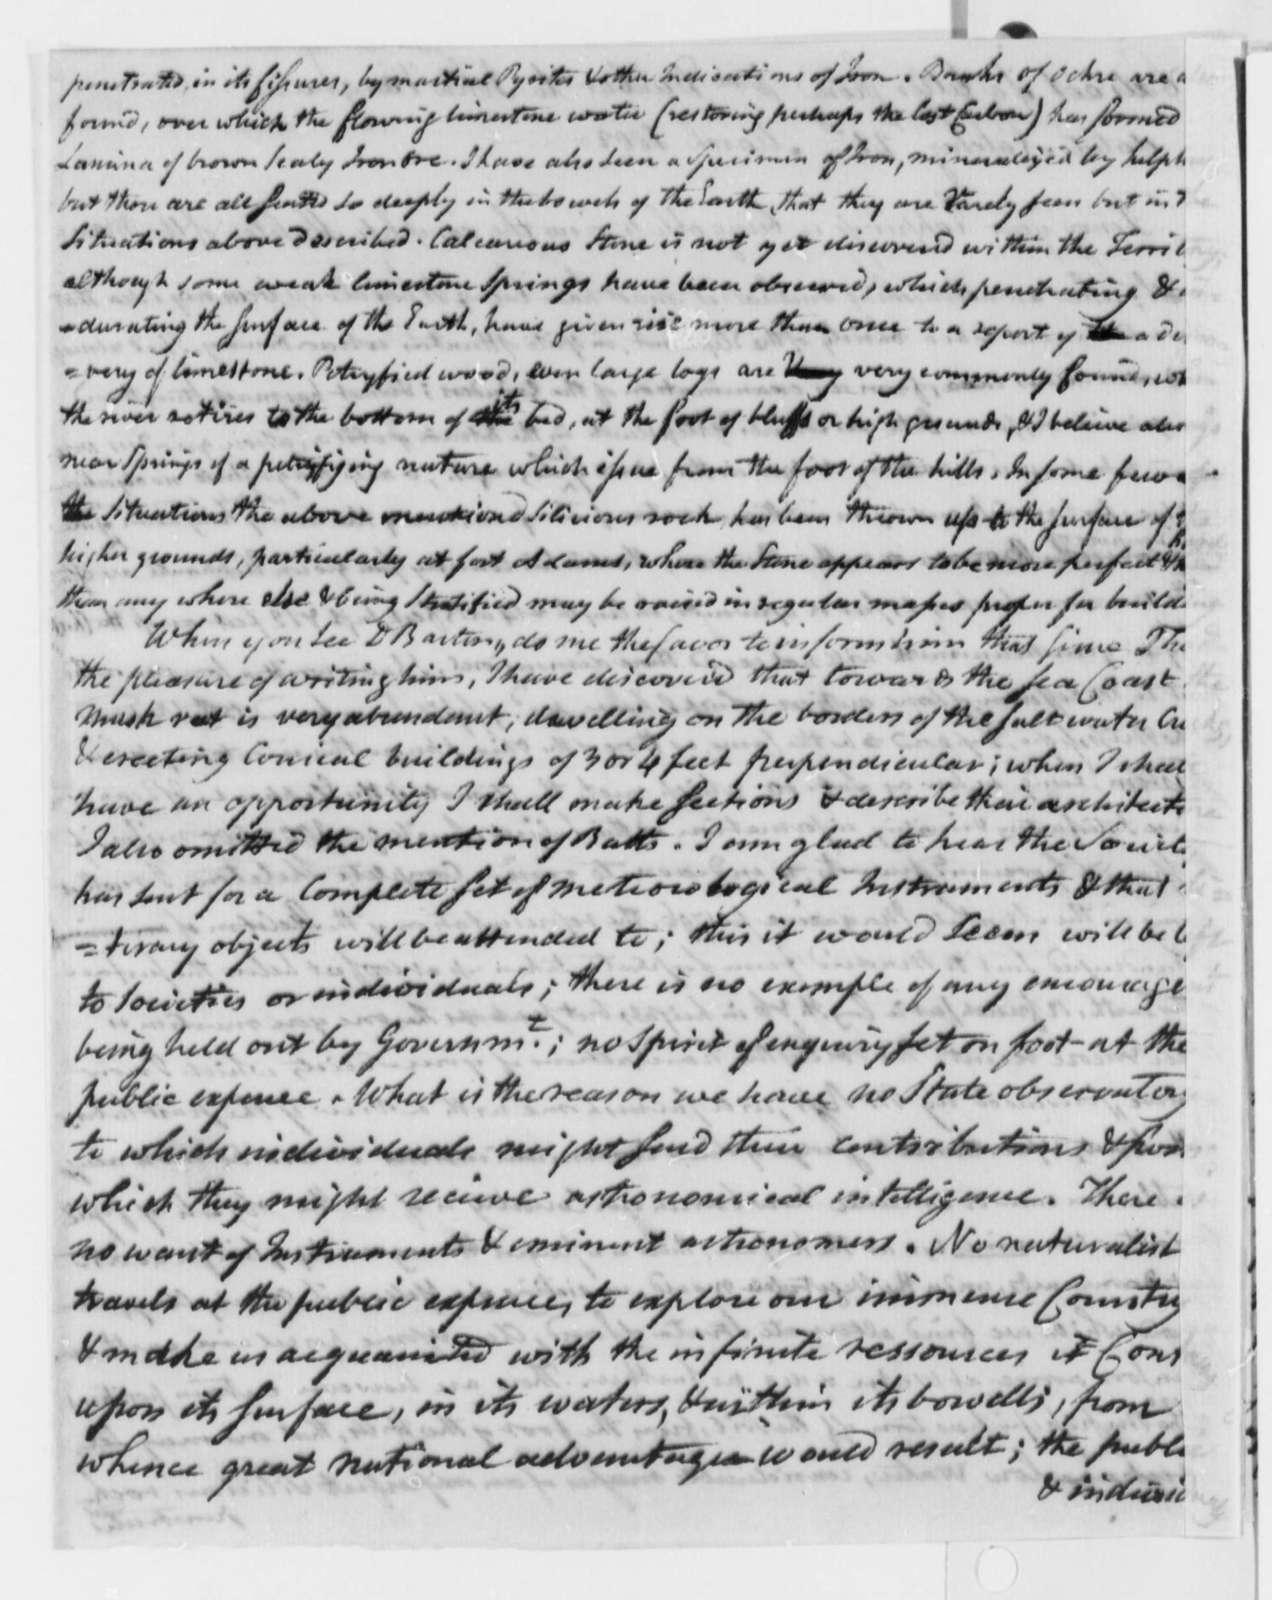 William Dunbar to John Vaughan, March 21, 1802